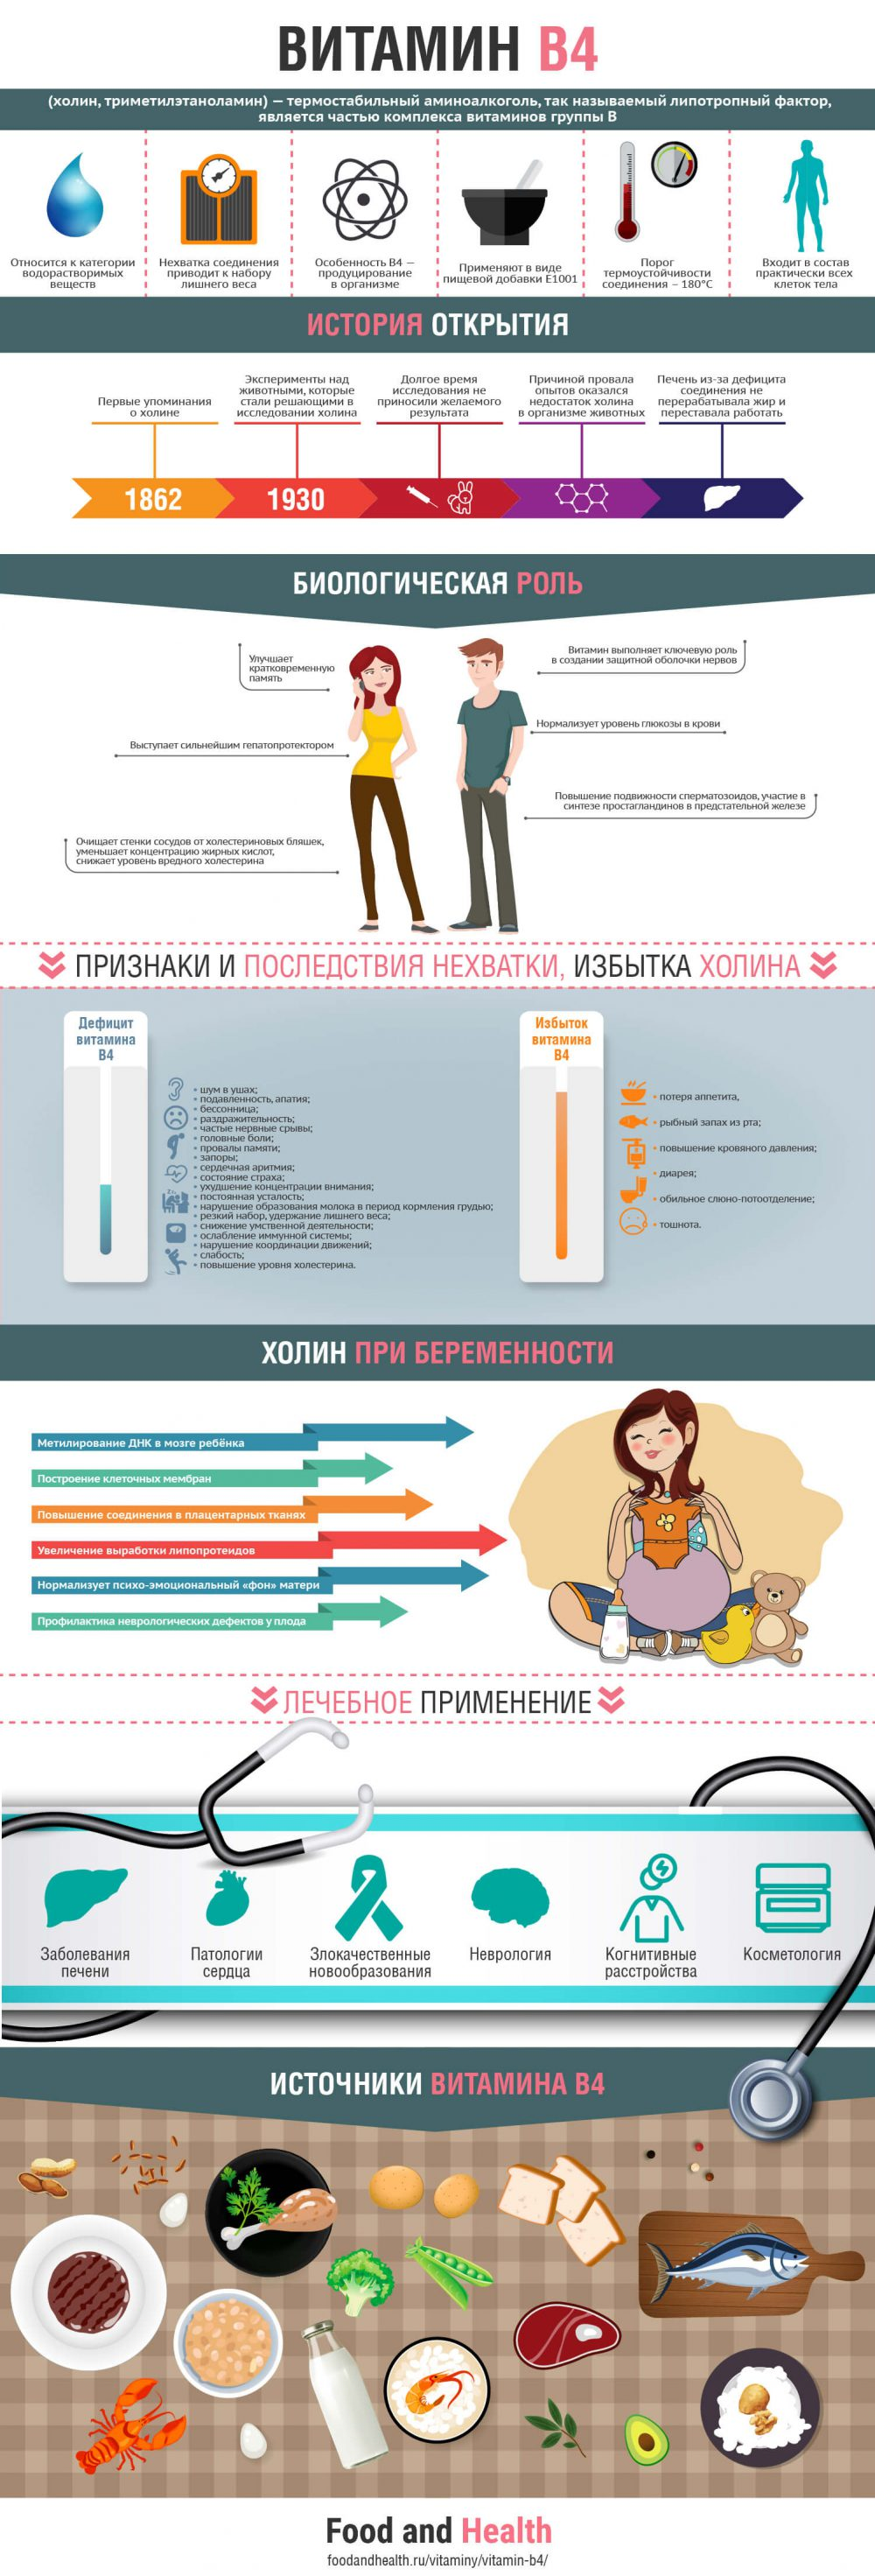 Витамин B4 - инфографика